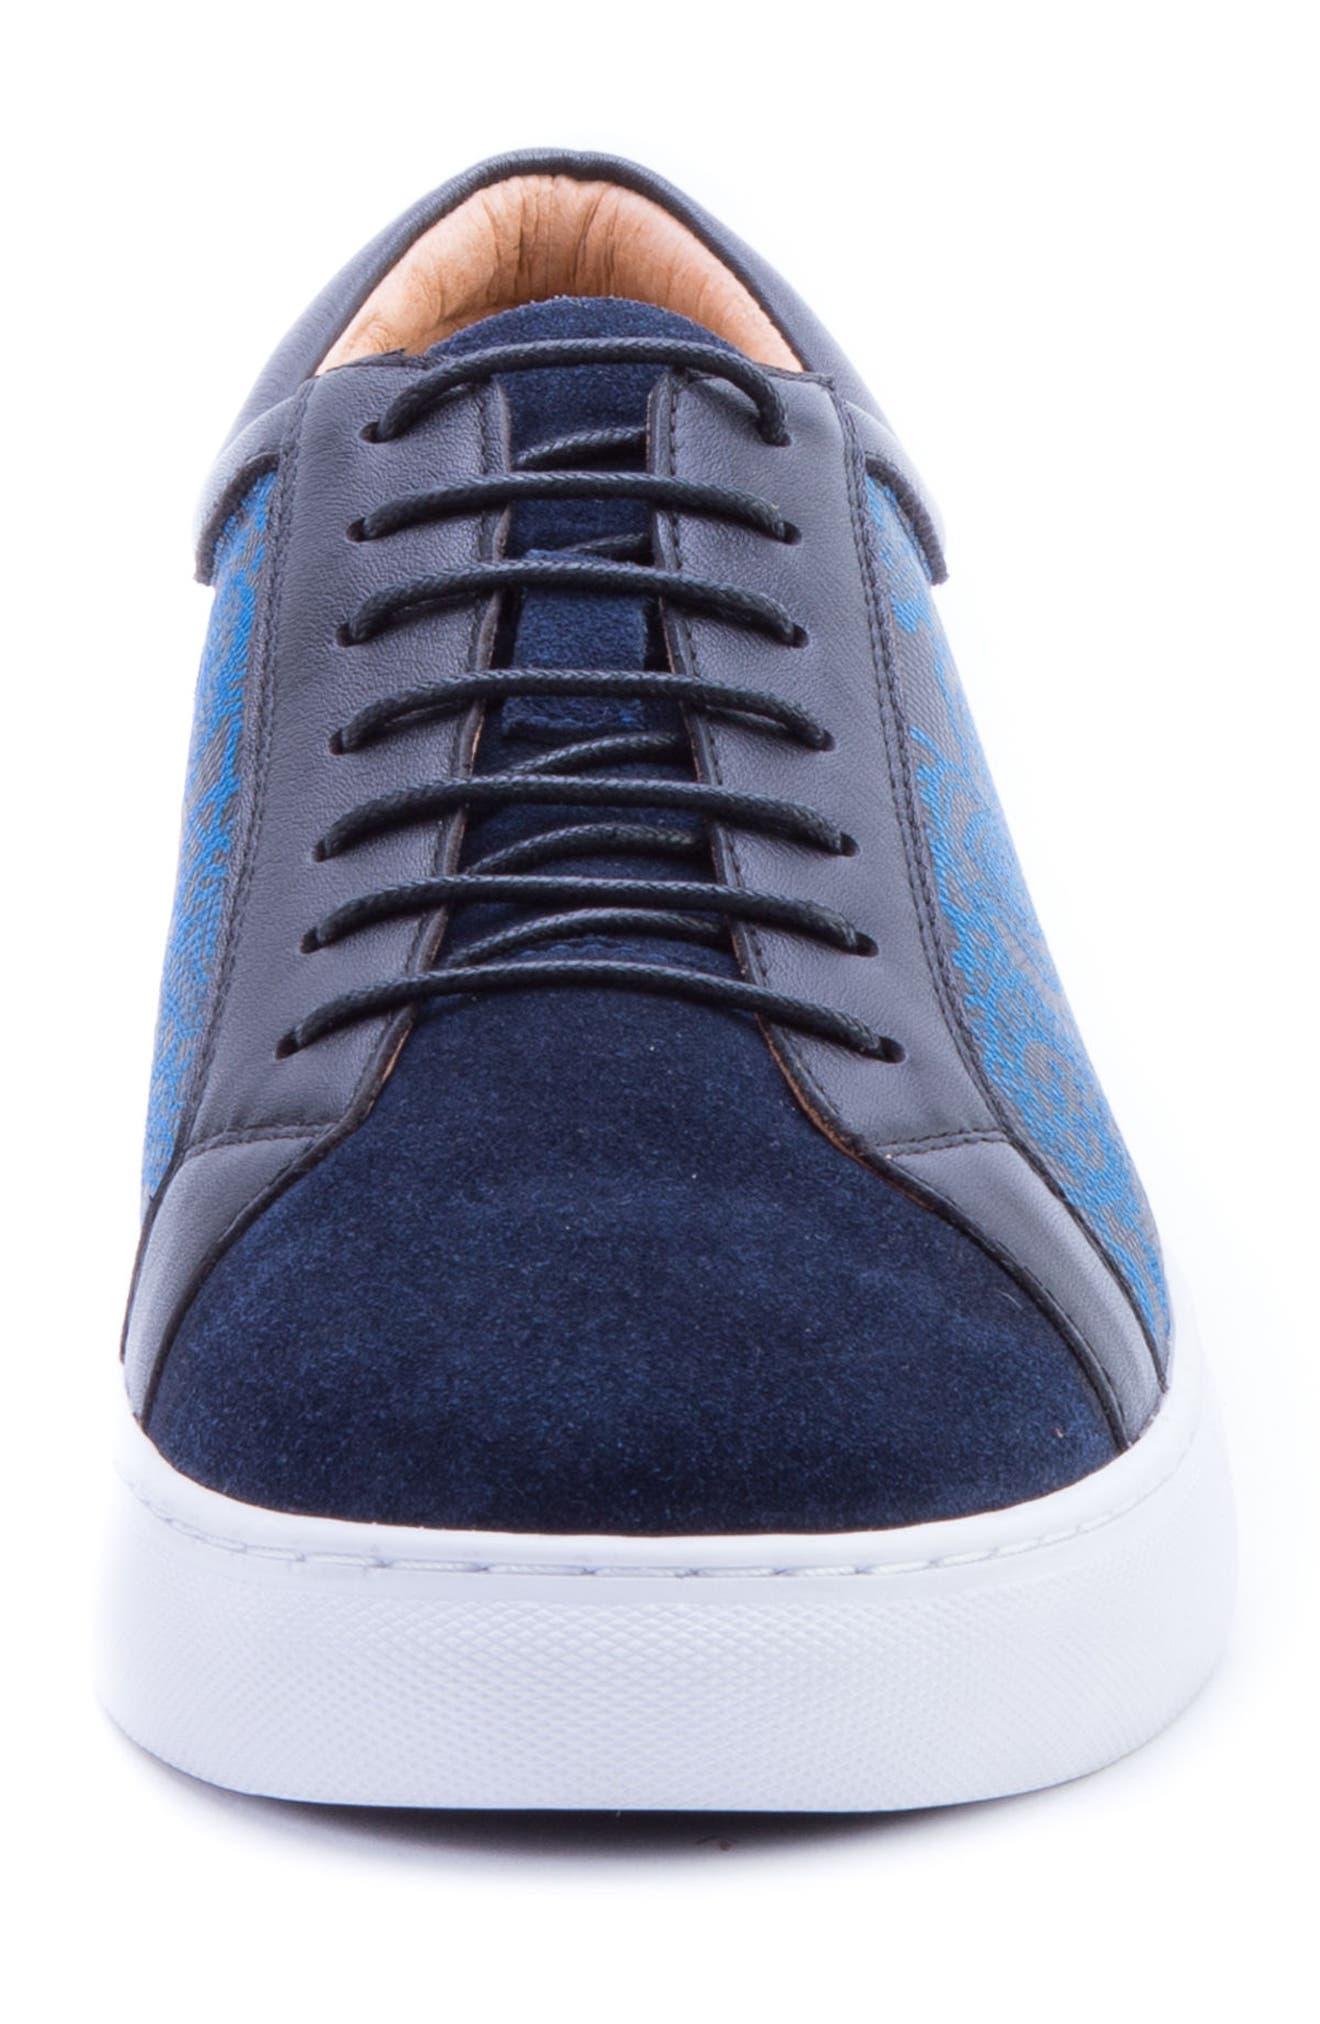 Rubio Floral Sneaker,                             Alternate thumbnail 4, color,                             Navy Suede